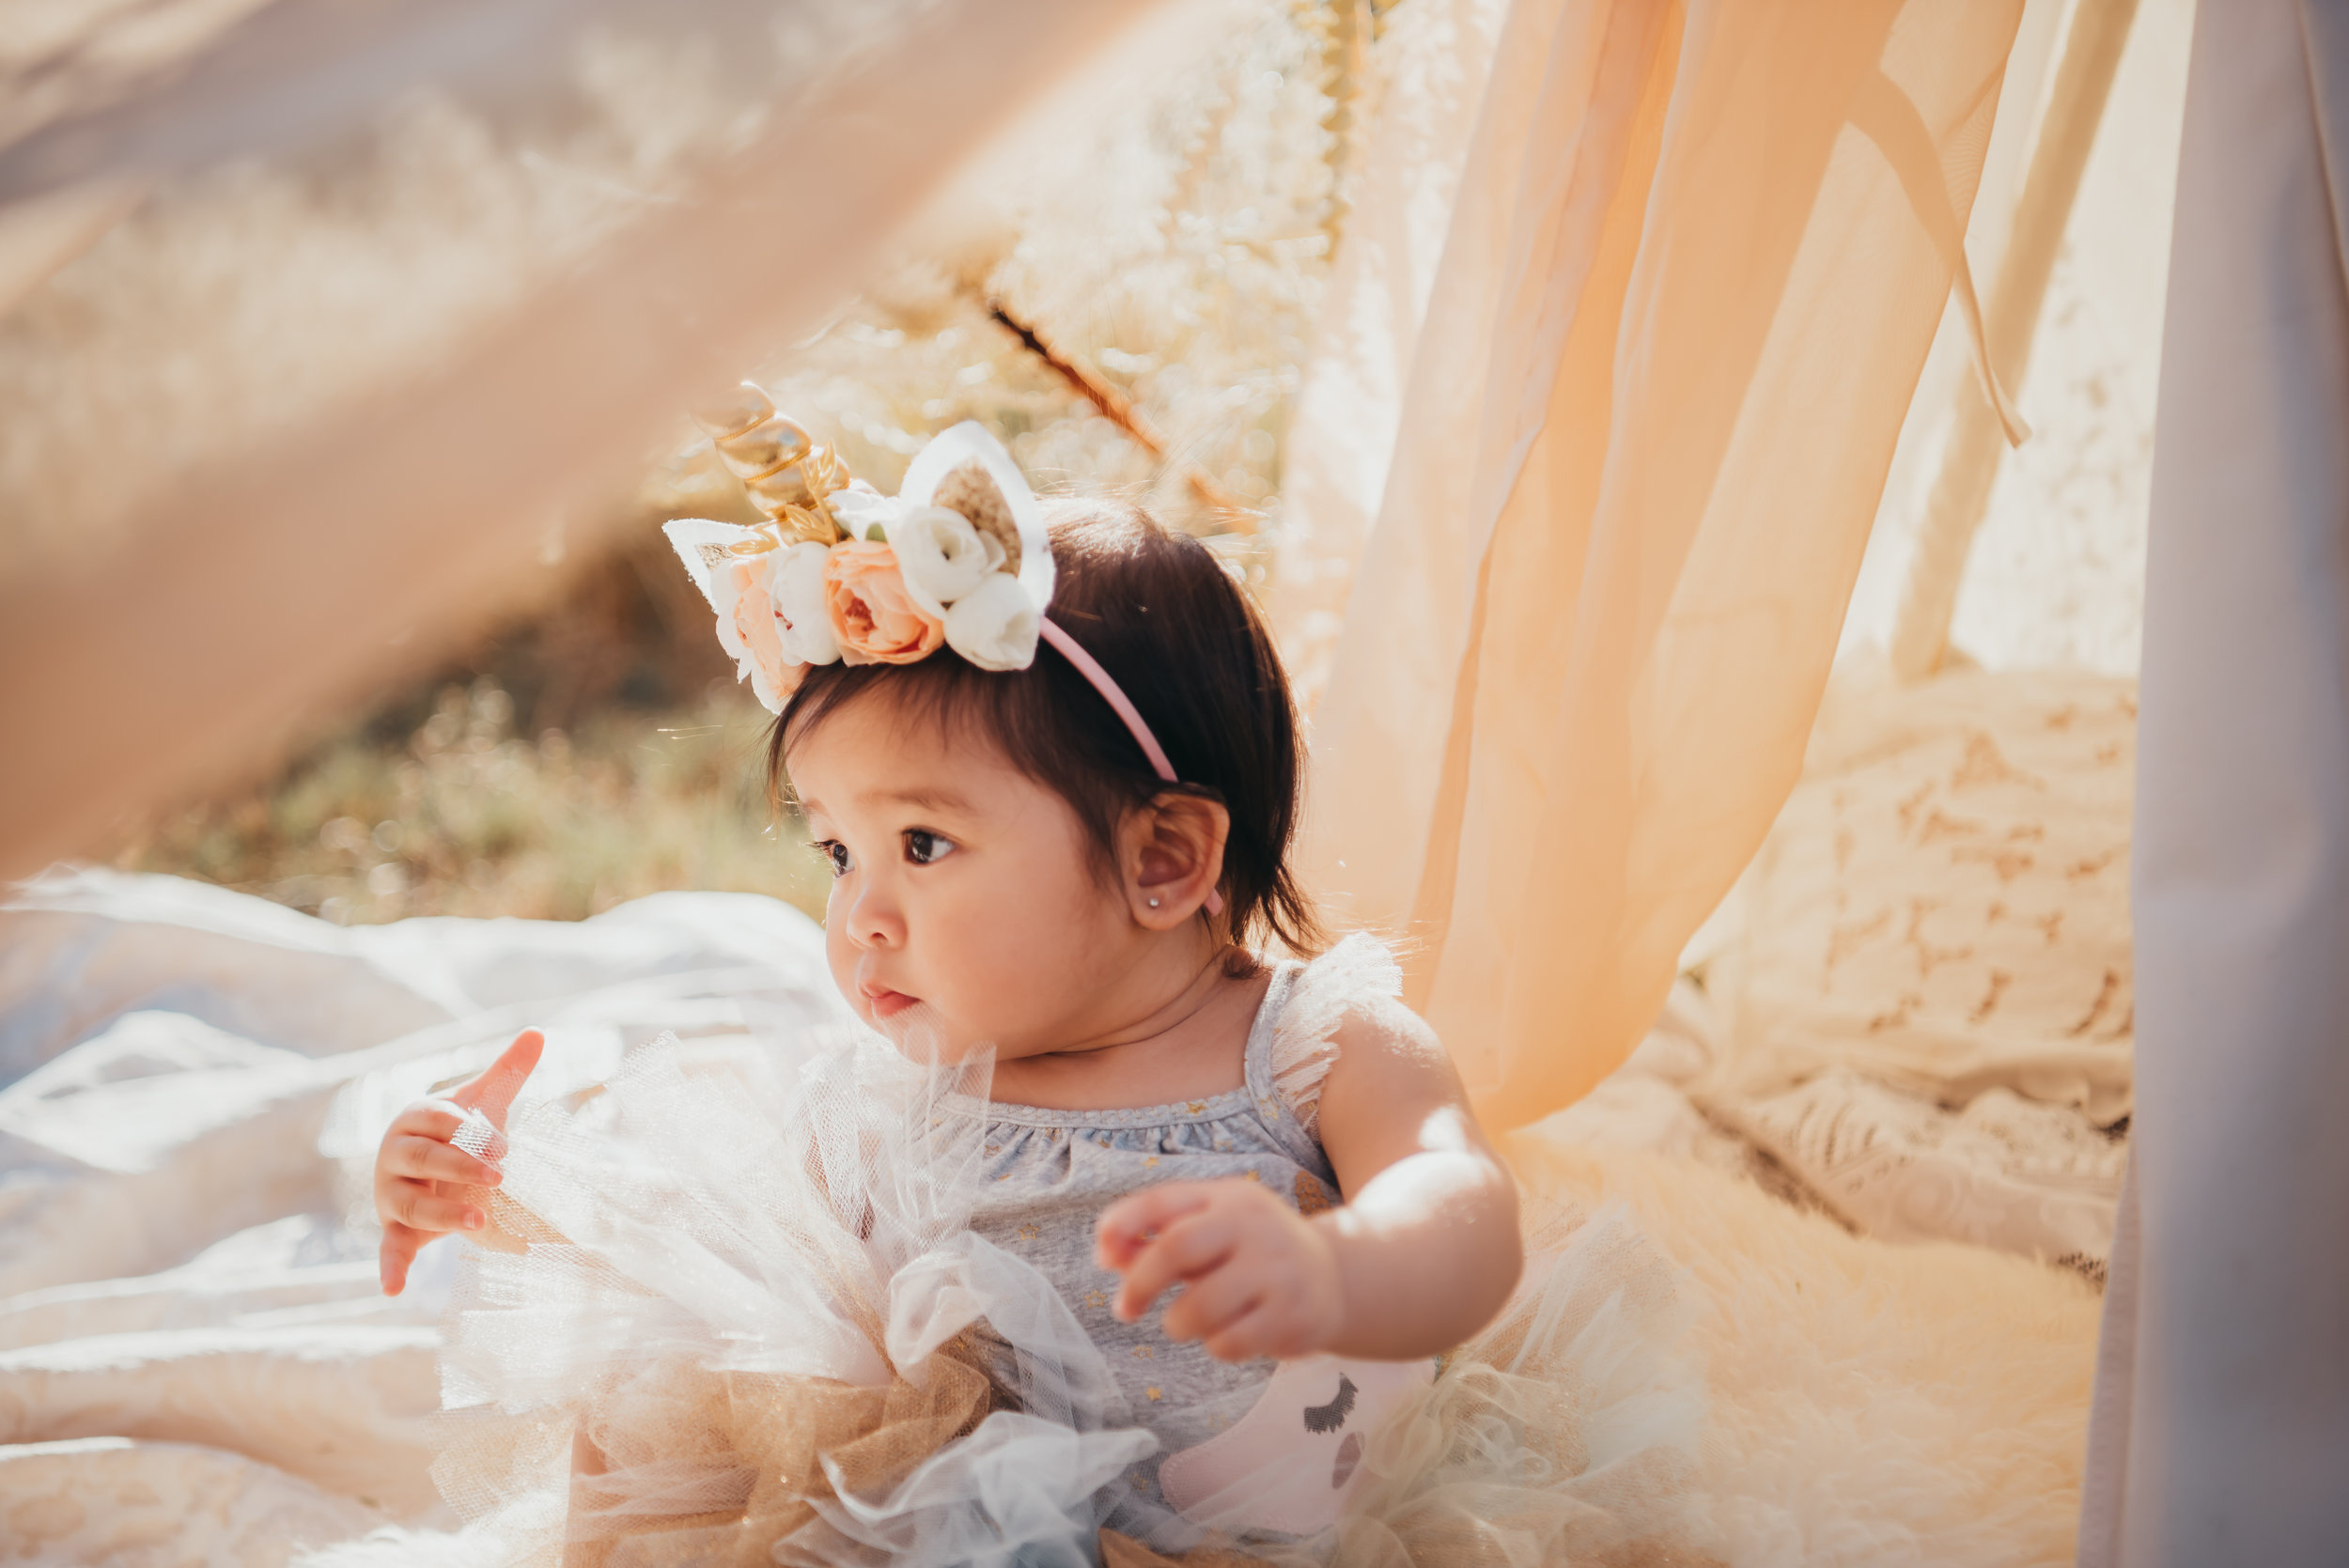 FINAL_Lets_Spread_Beauty_Photography_Landon_Newborn20180903_0021.jpg